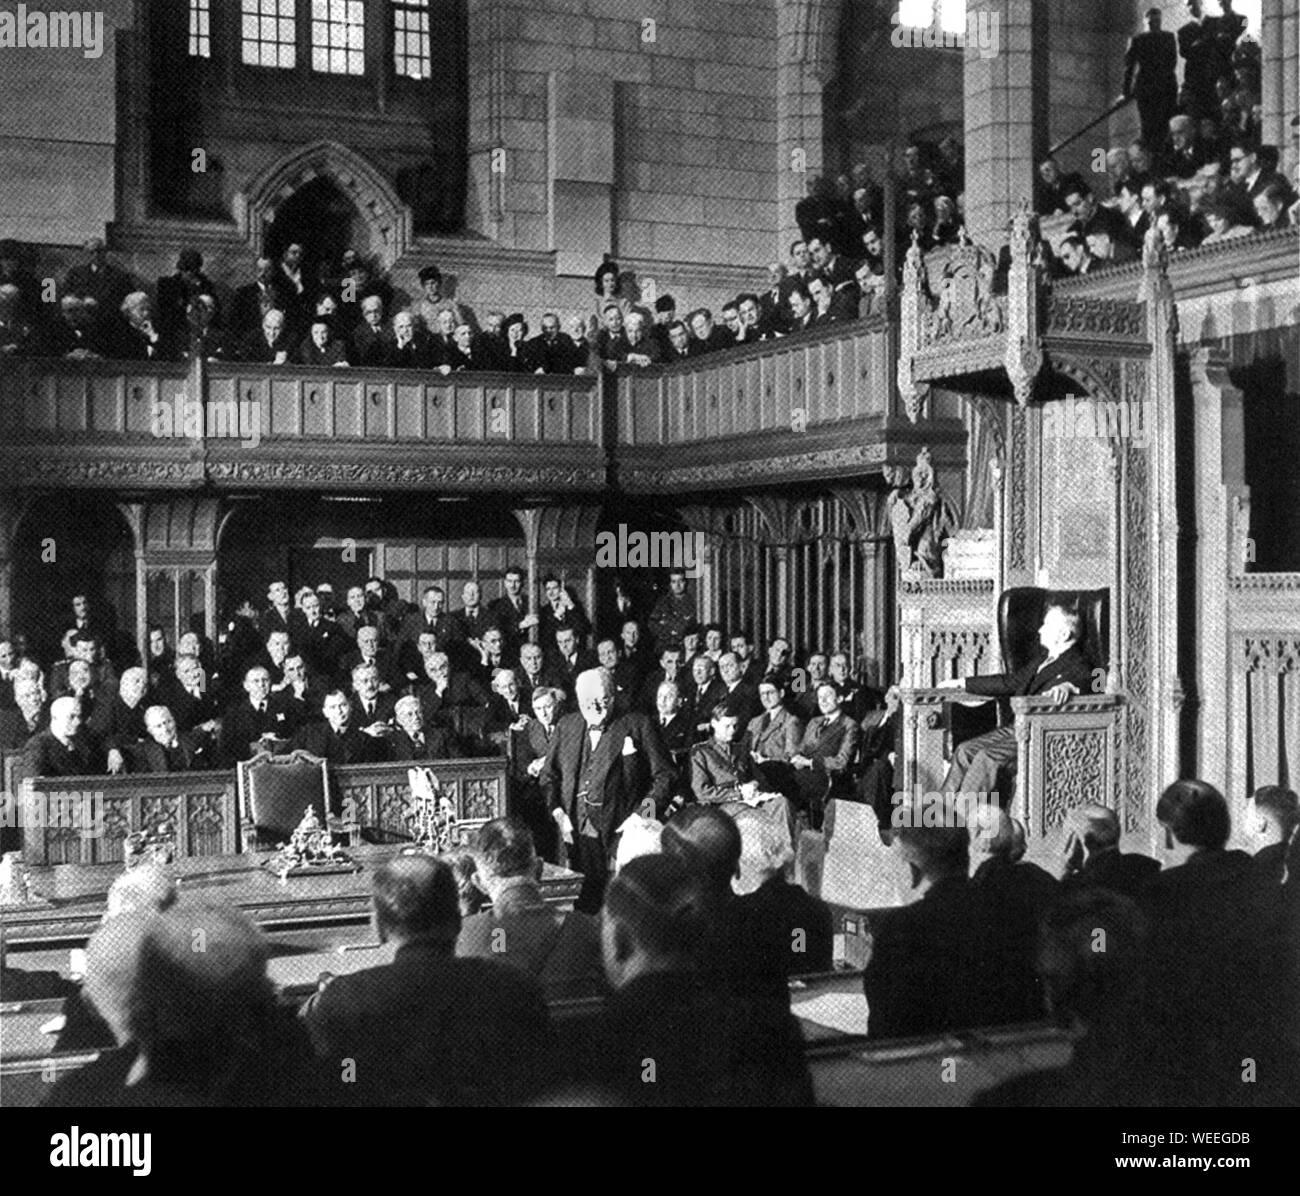 Winston Churchill addresses Canadian Parliamentarians in Ottawa. Stock Photo